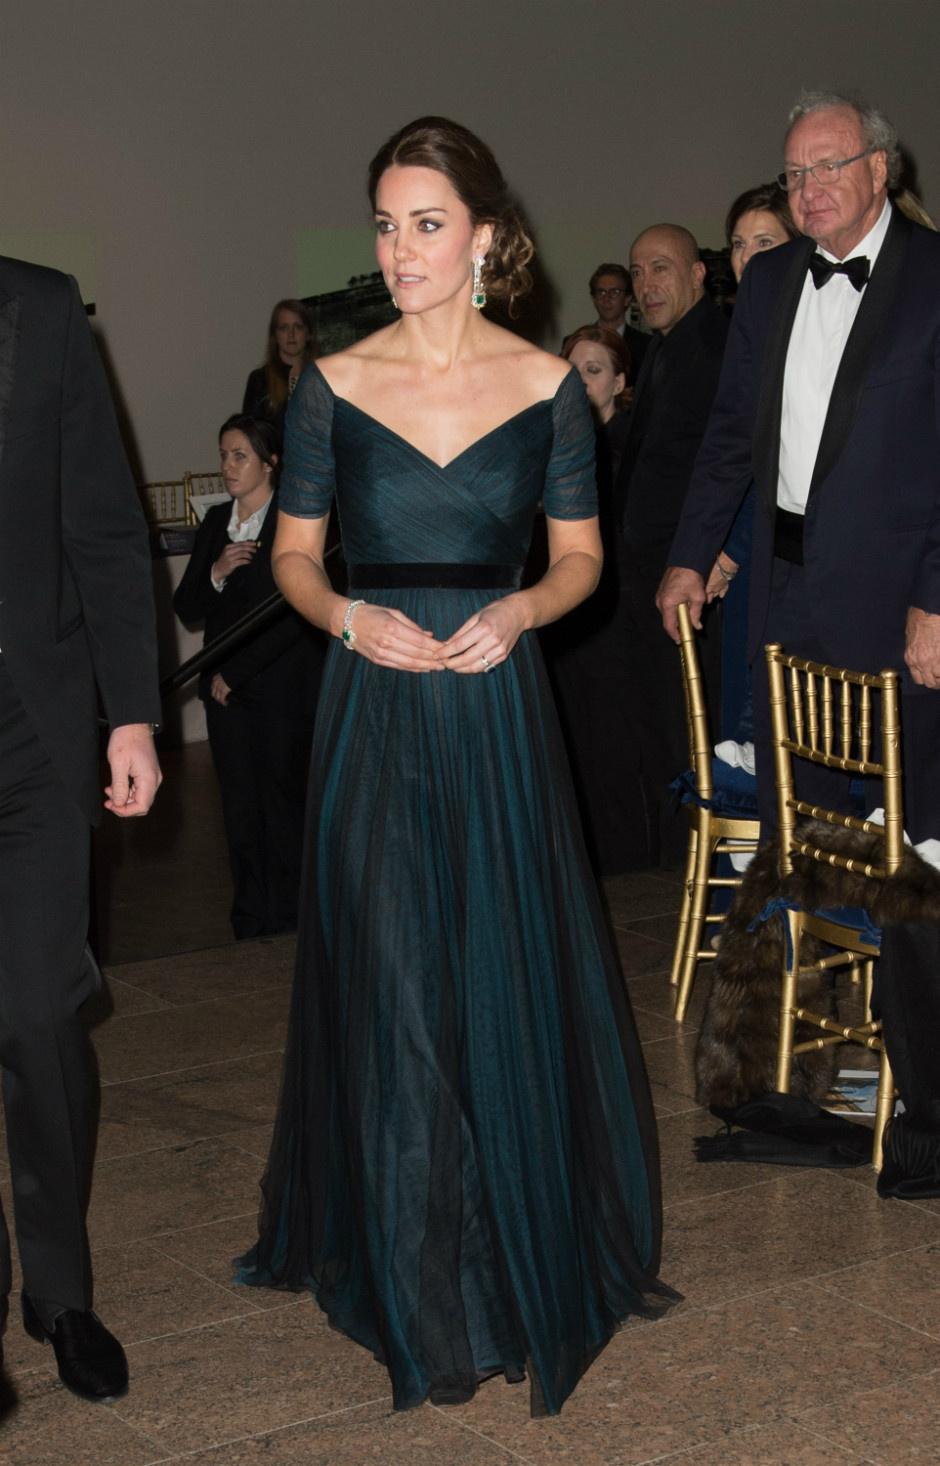 10 раз, когда Кейт Миддлтон пренебрегла королевским дресс-кодом фото [5]